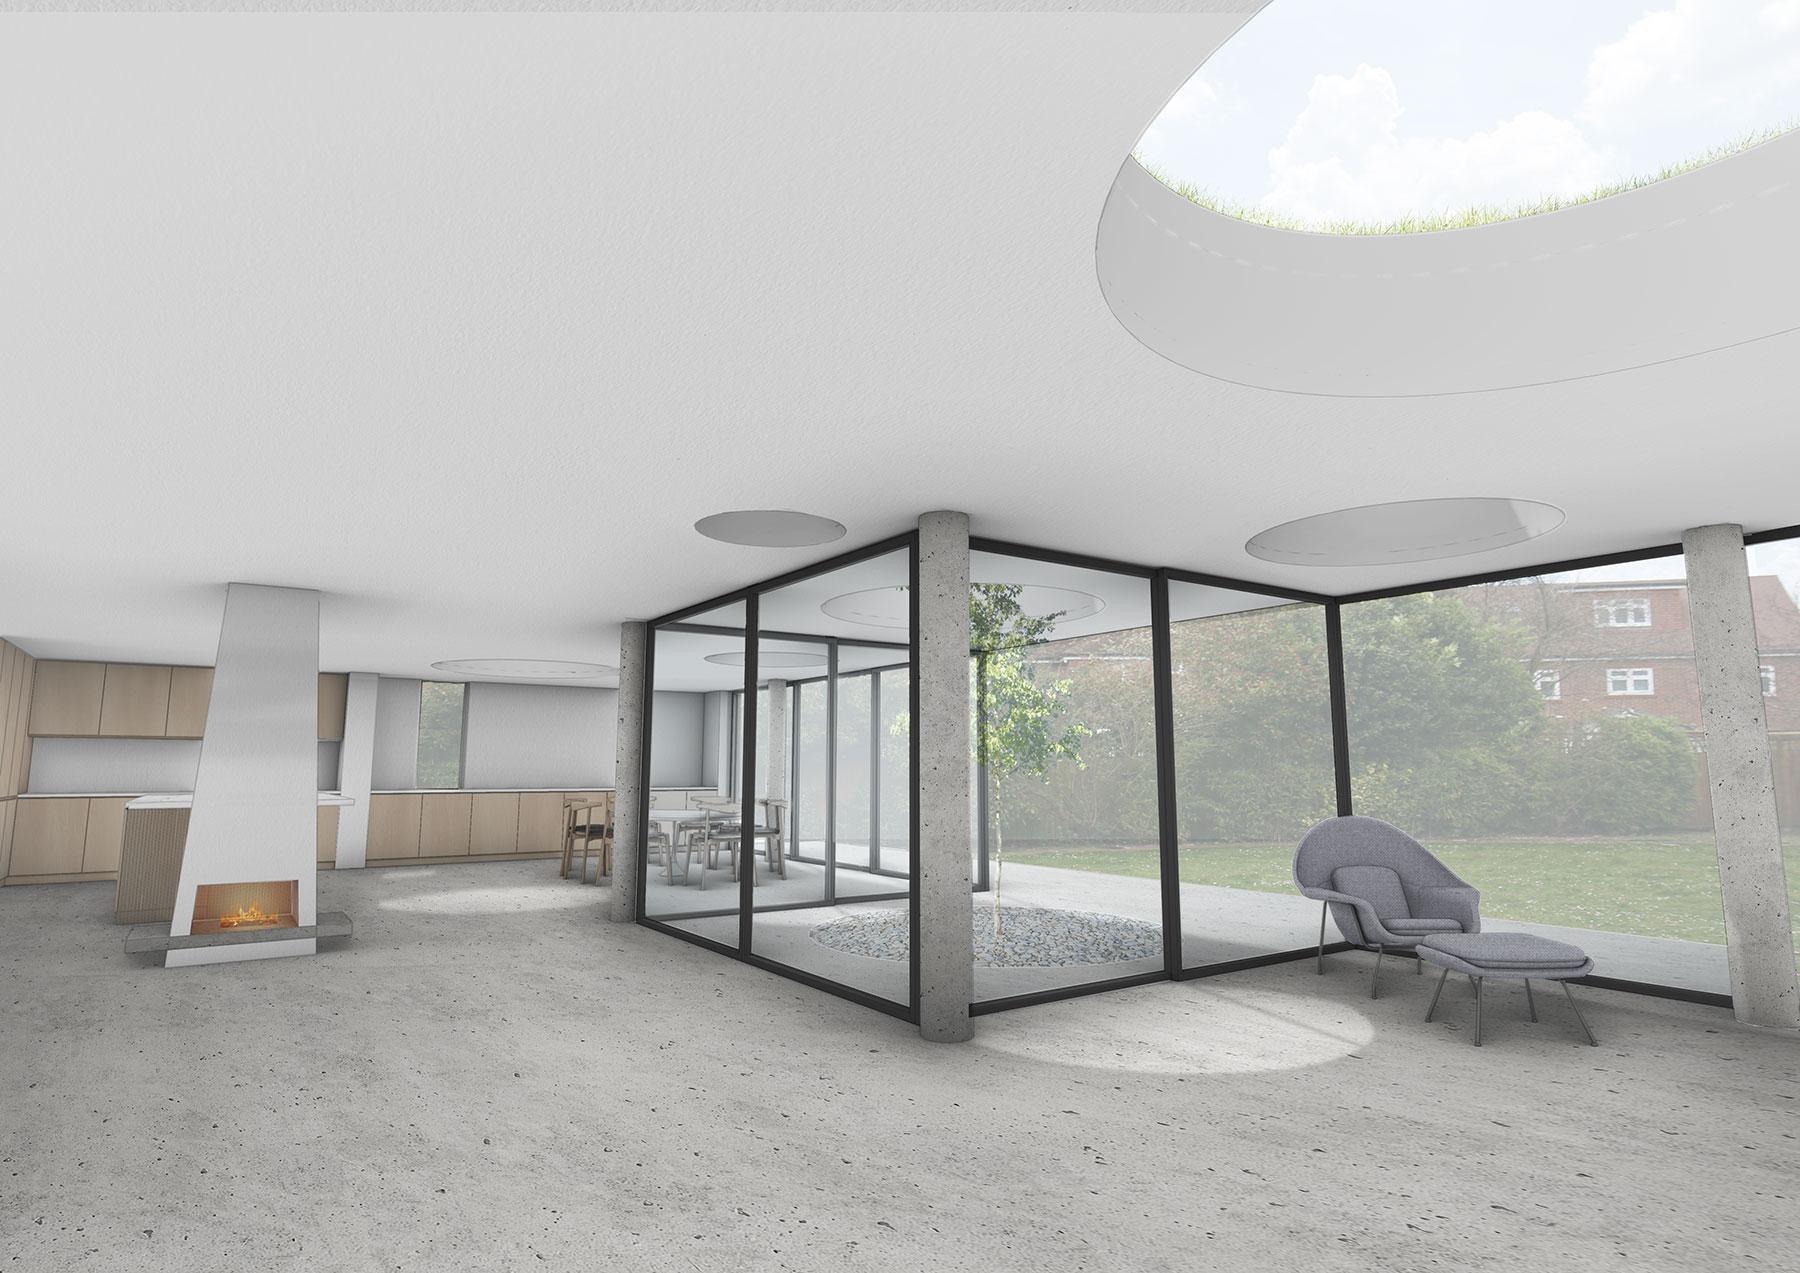 Interior-Perspective-01.jpg